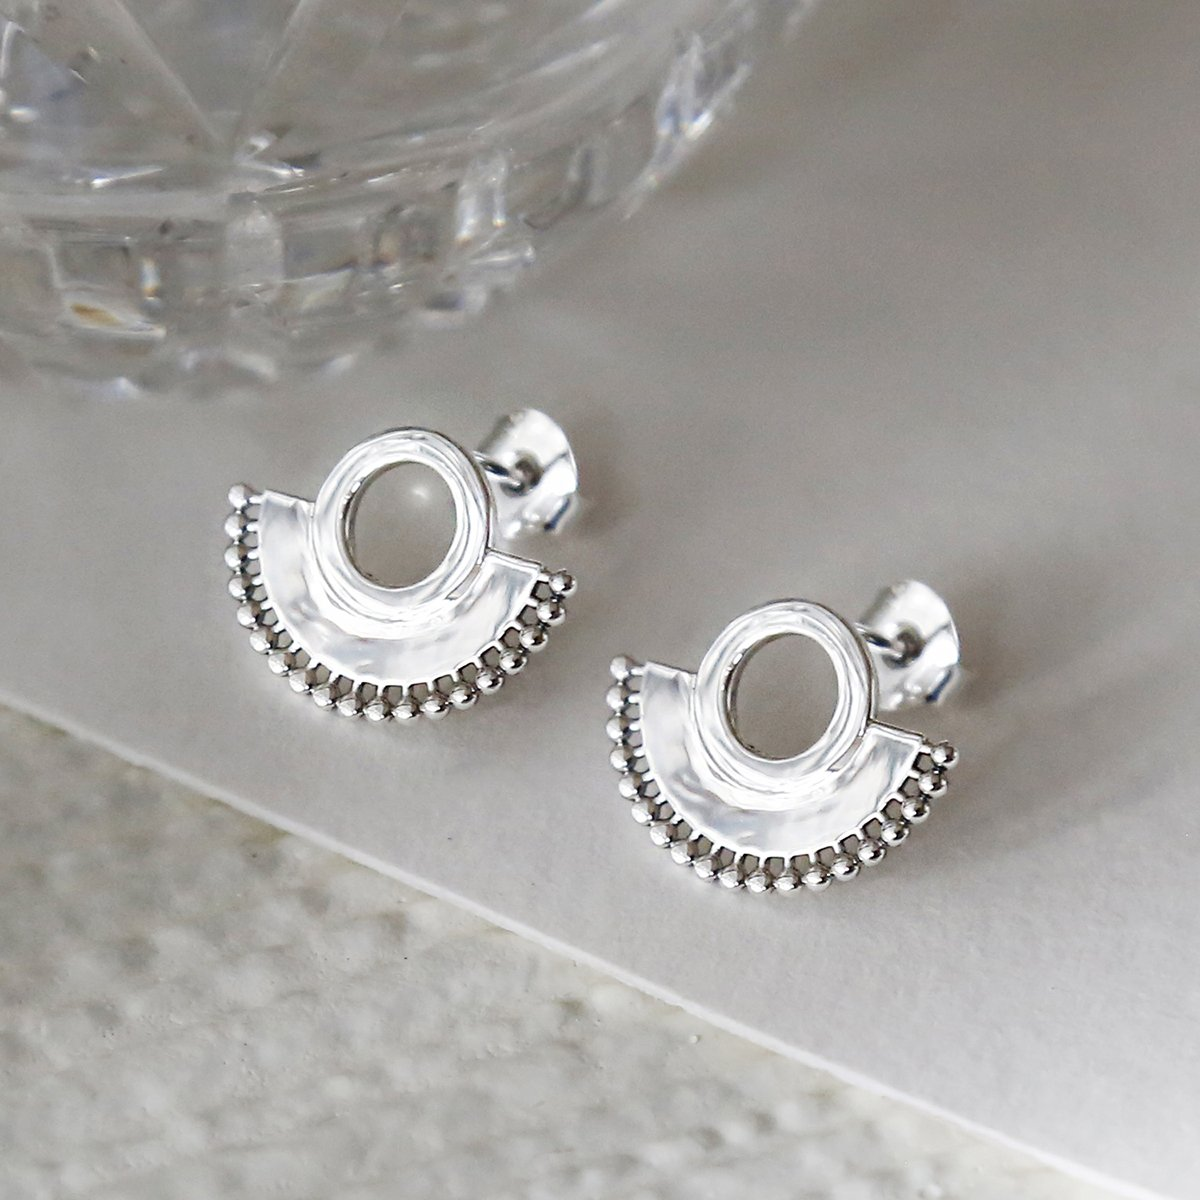 Sterling silver art deco sunburst stud earrings close up on great background